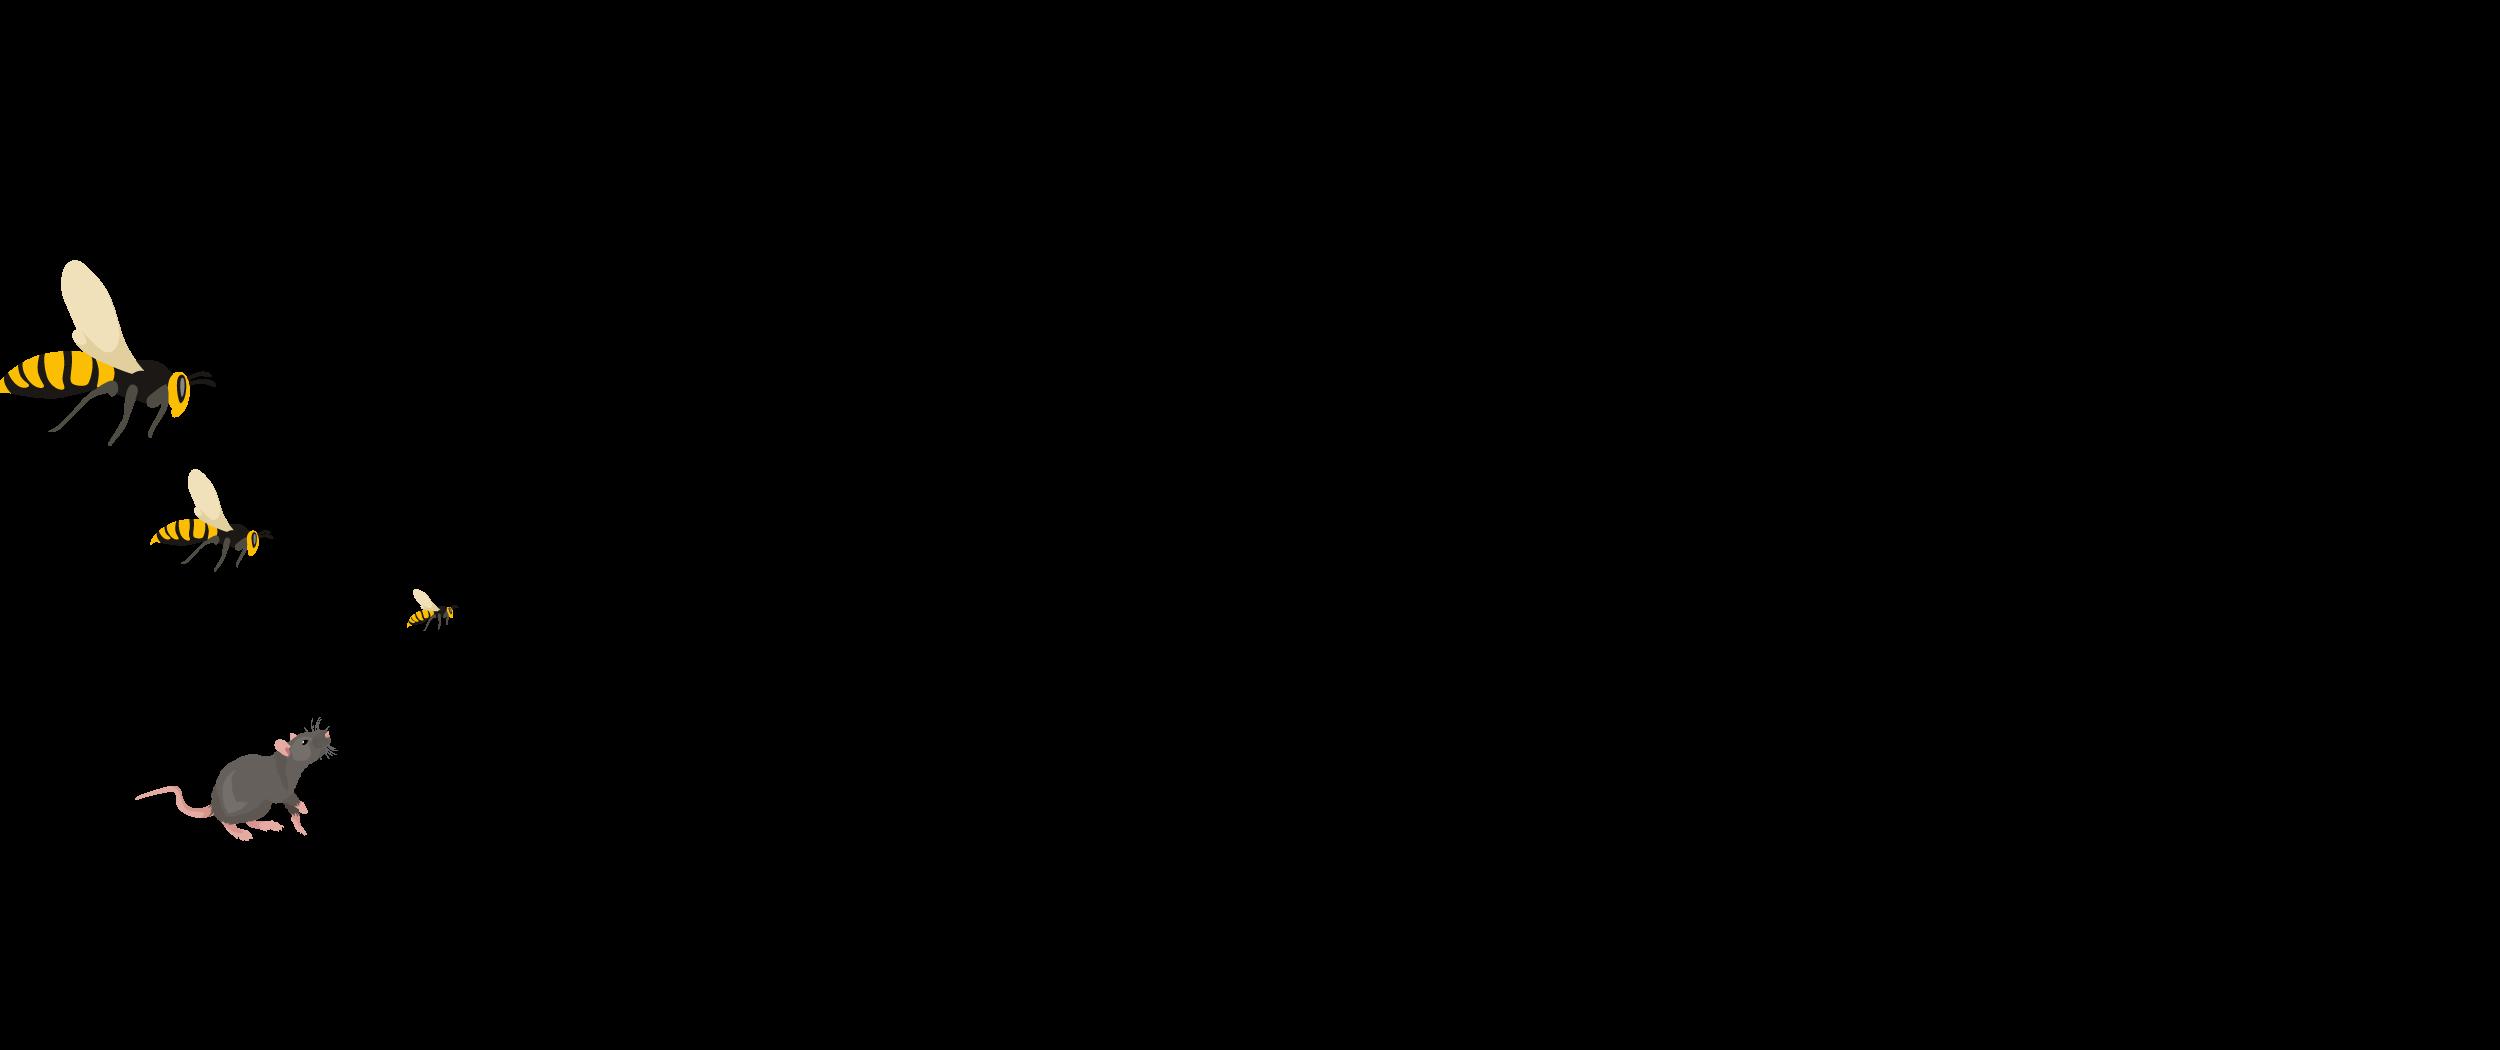 Schädlingsbekämpfung Eschwege Wespen Schaben